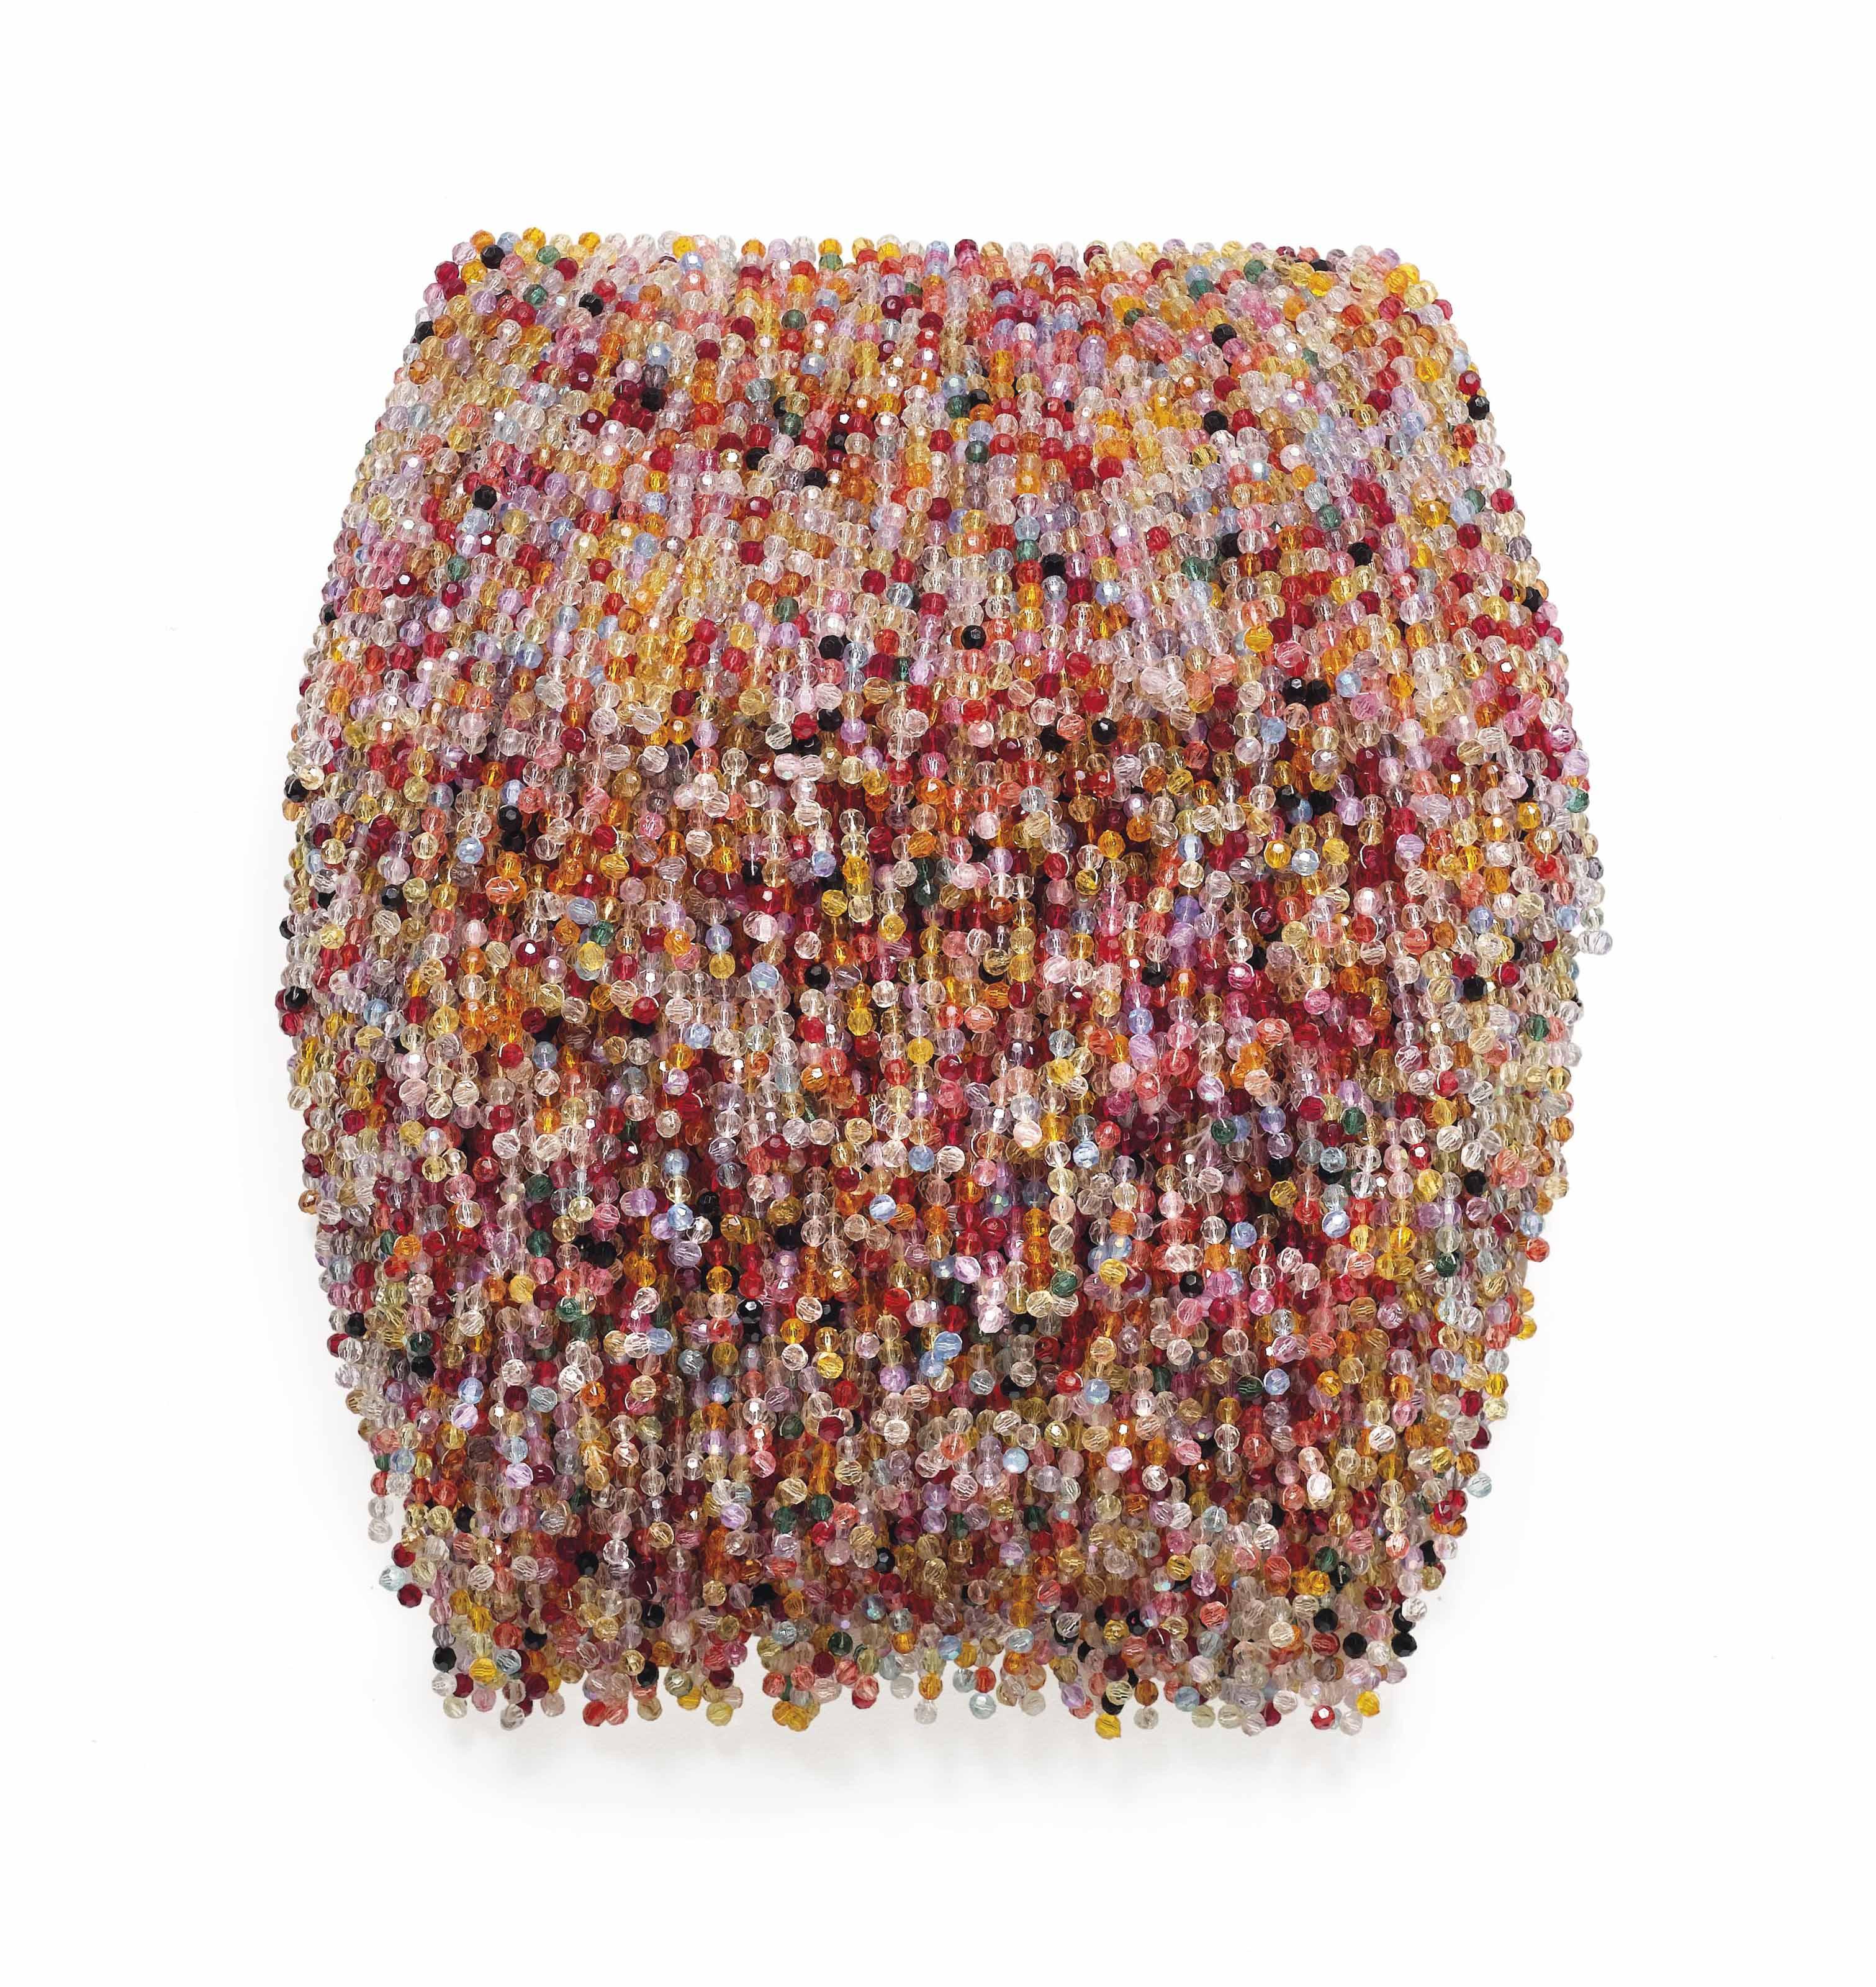 Untitled (beads)